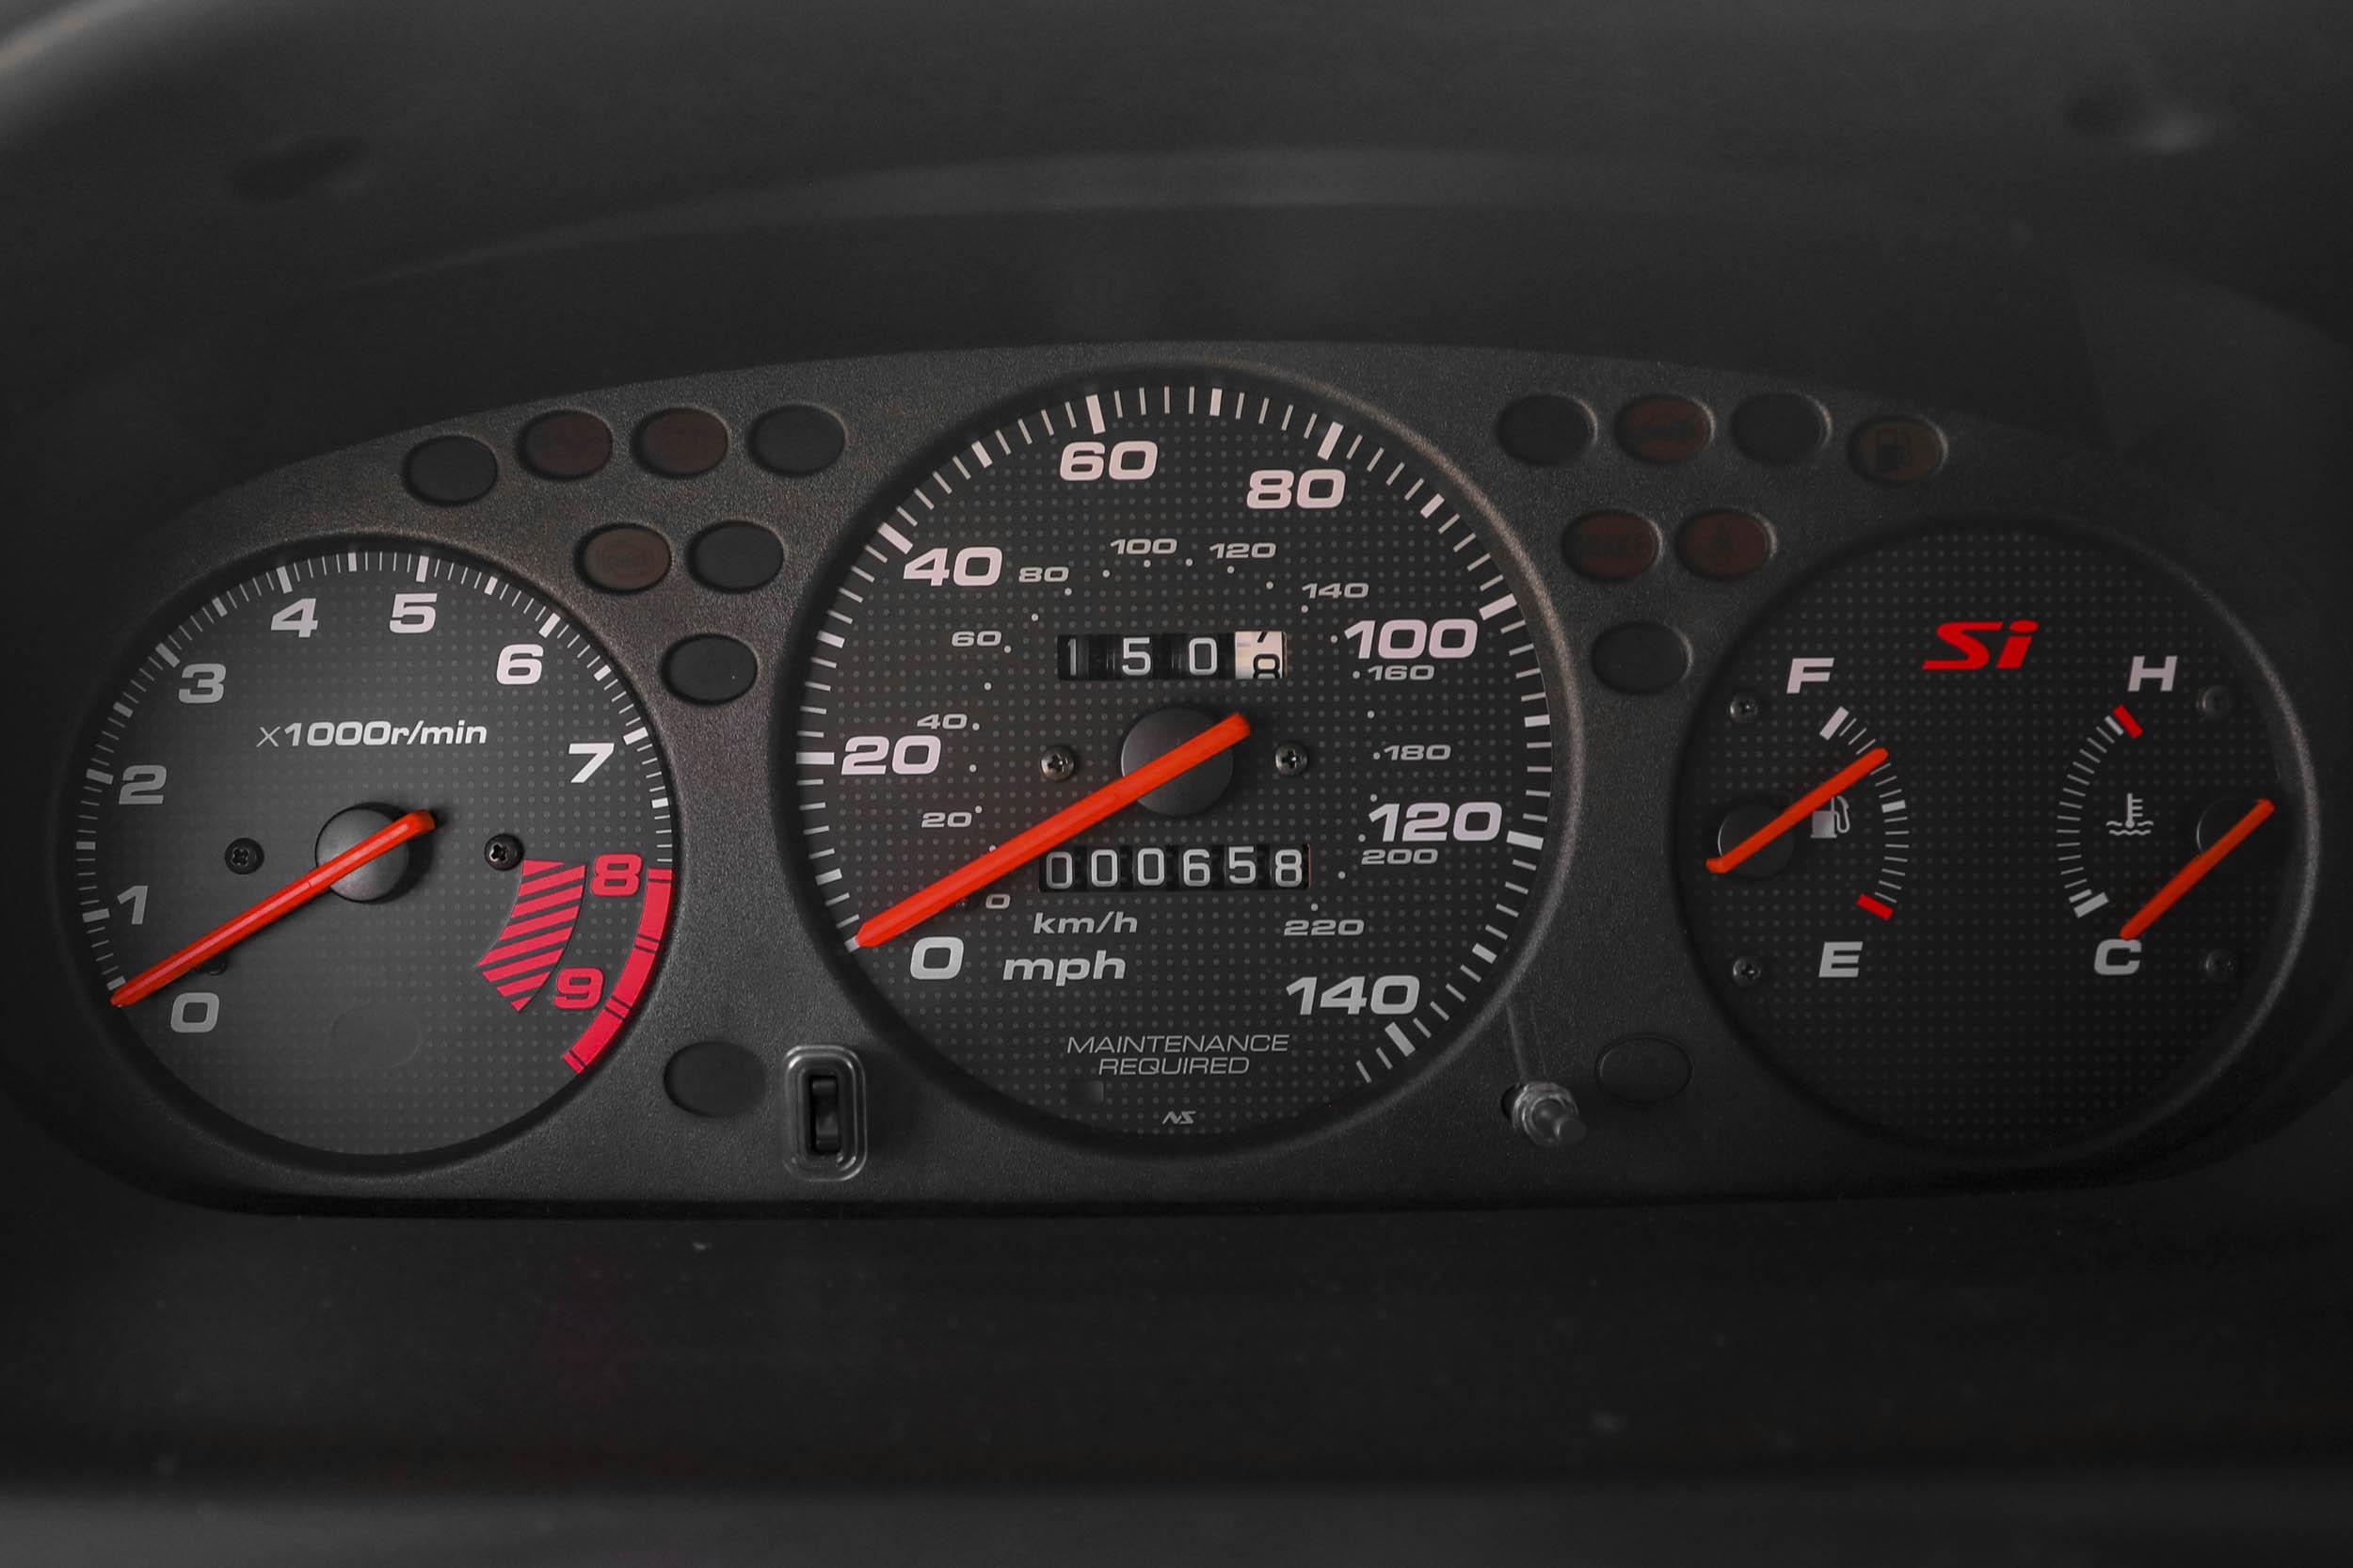 1999 Honda Civic Si gauges